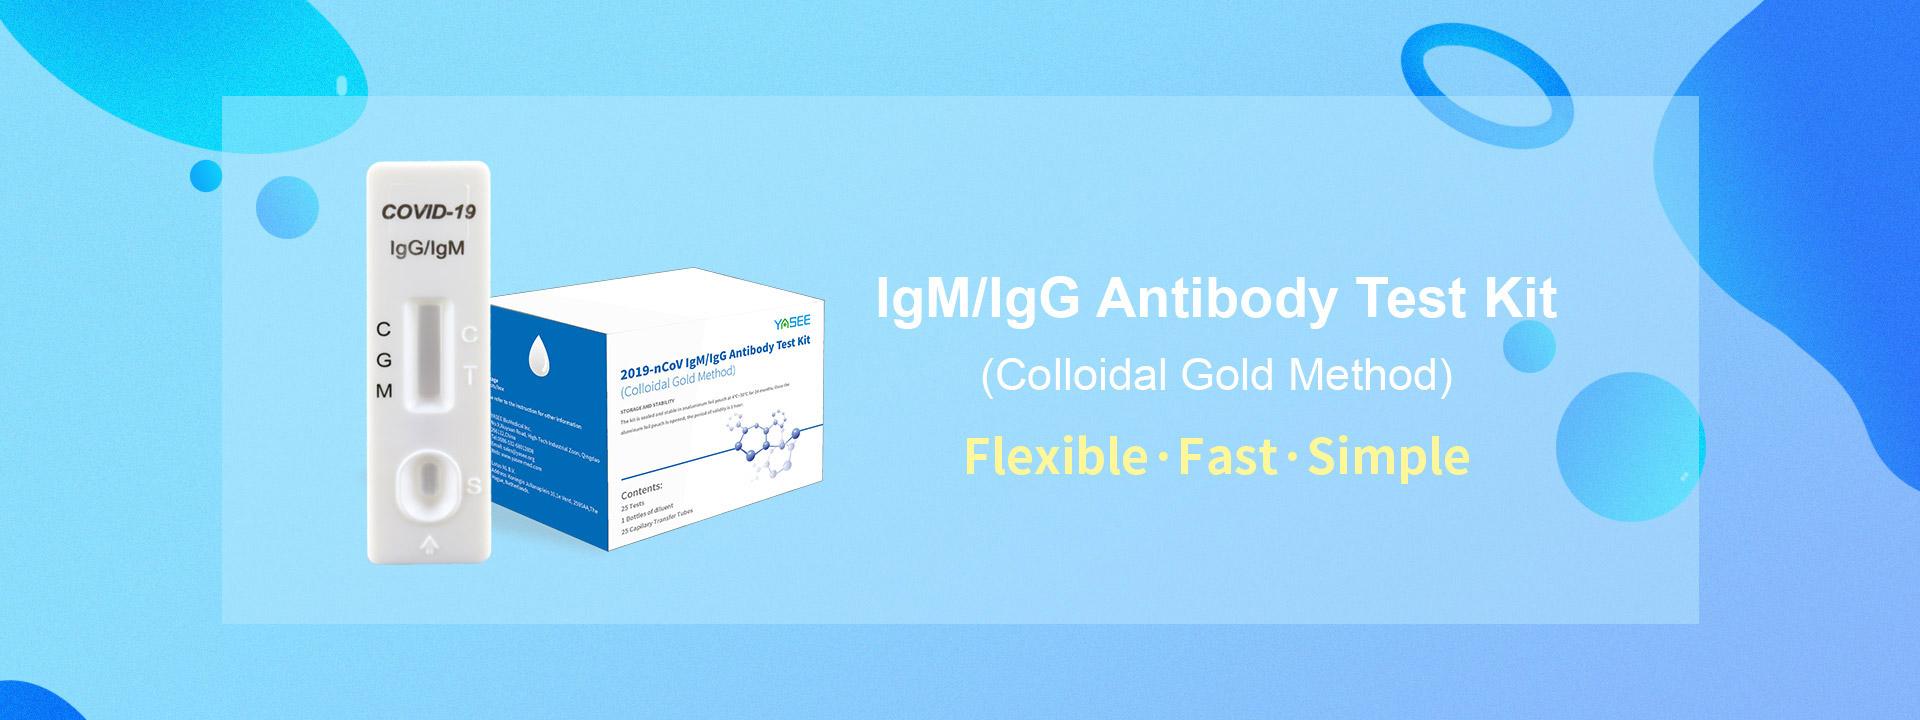 YS IgM IgG Antibody Test Kit